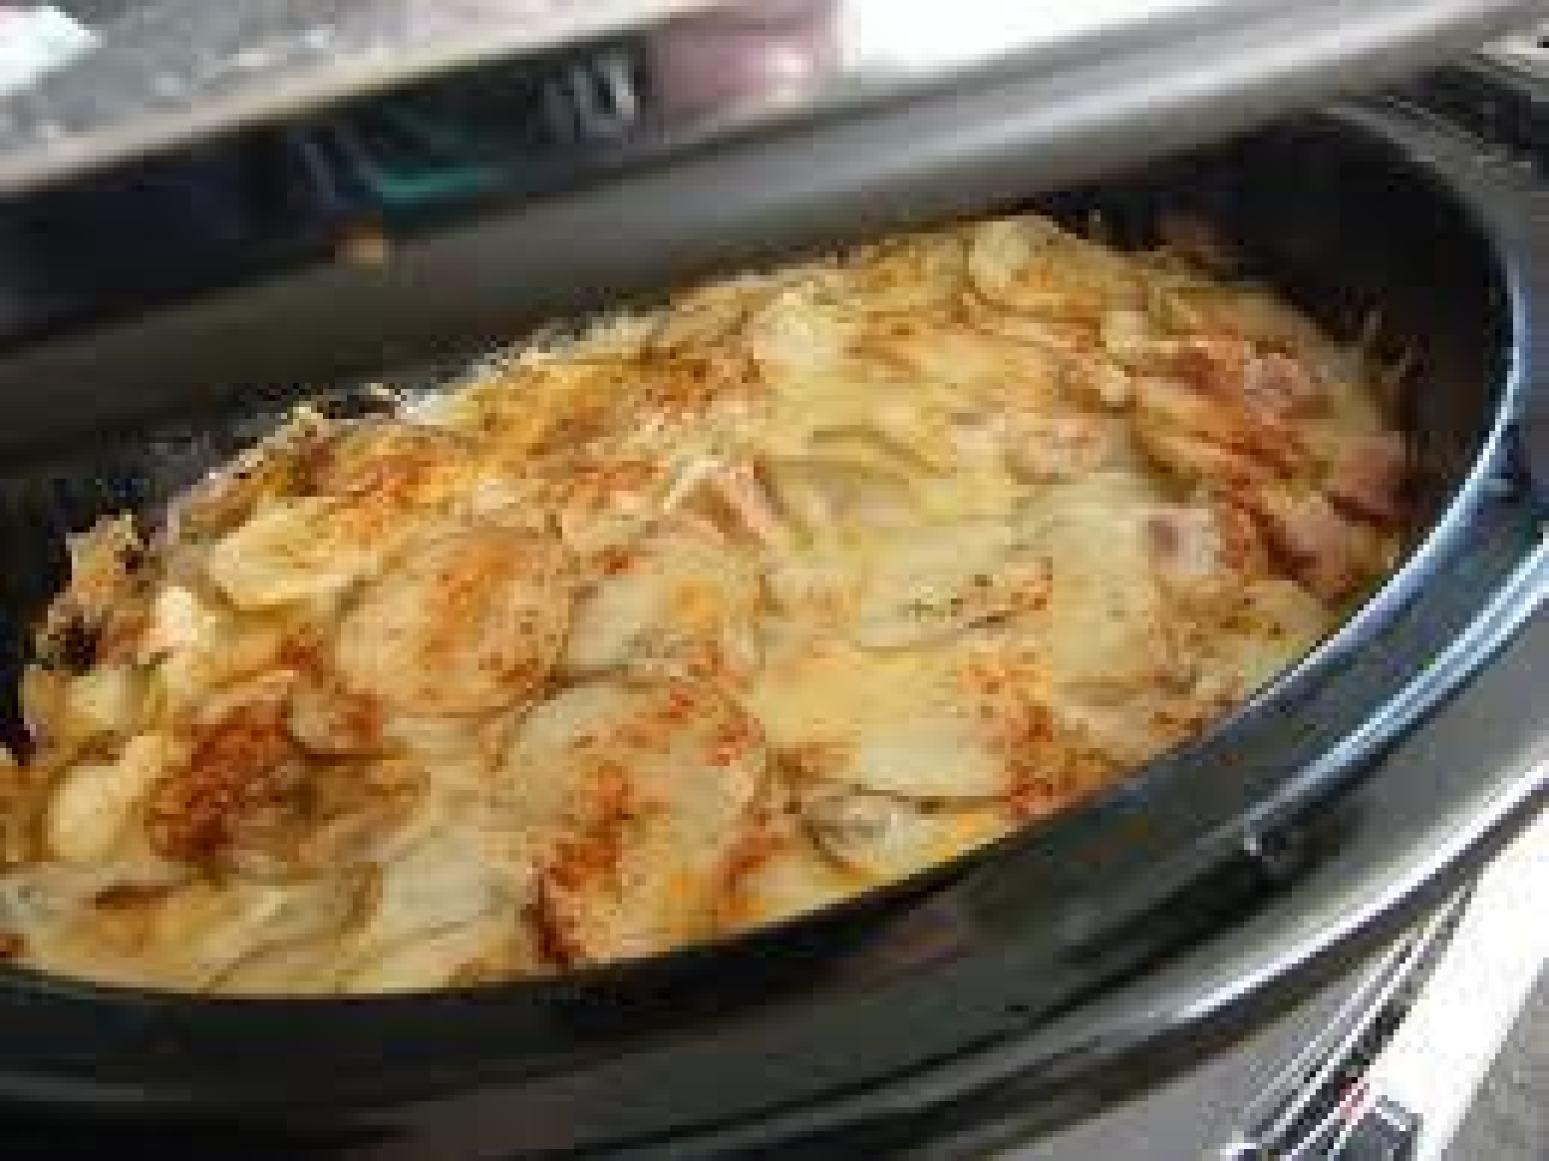 Crock Pot Potato Recipes  Crockpot Scalloped Potatoes & Ham Recipe